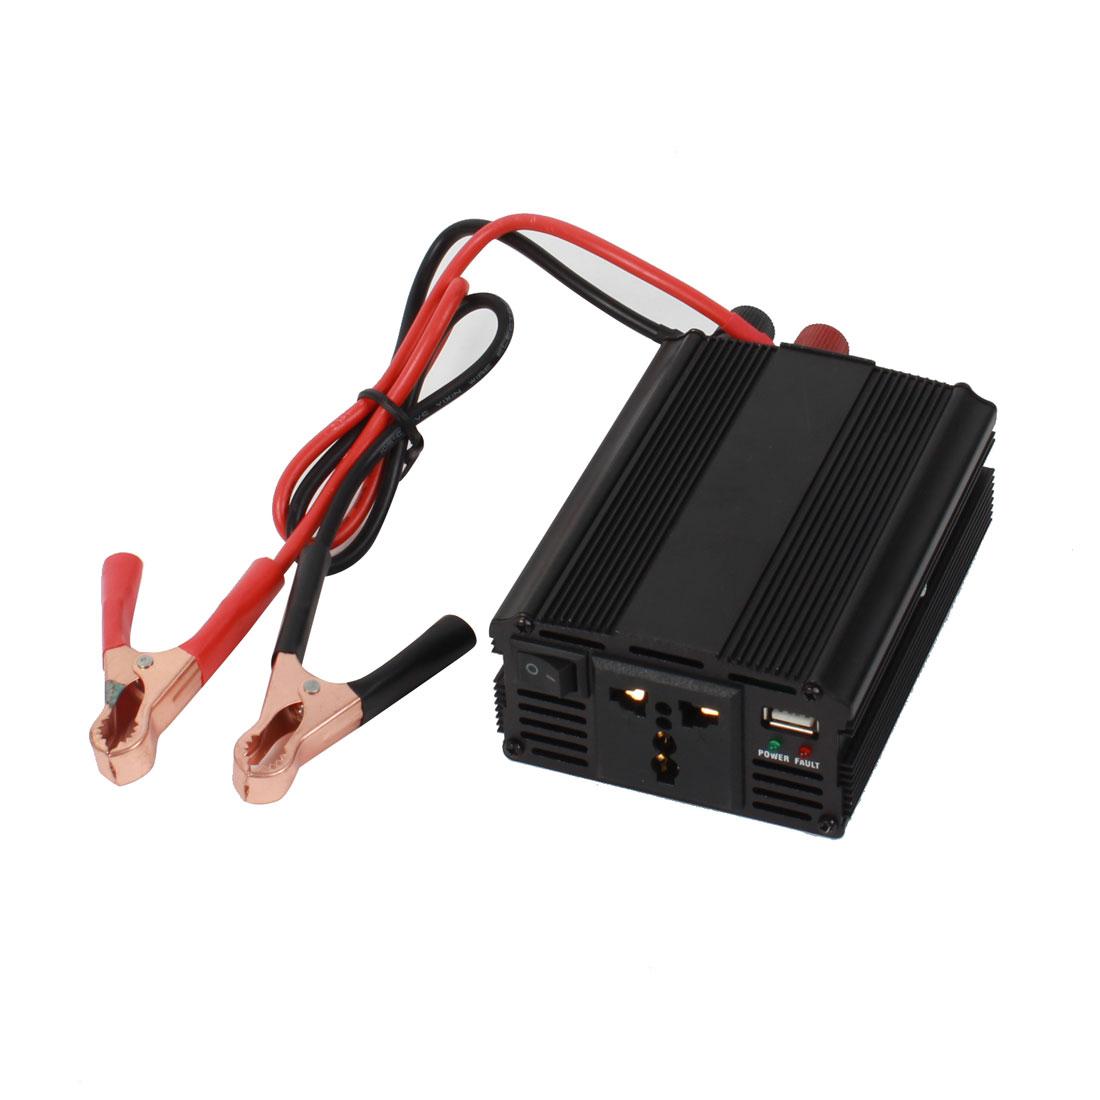 DC 12V/24V to AC 220V 500W DC/AC Voltage Power Converter Adapter Inverter